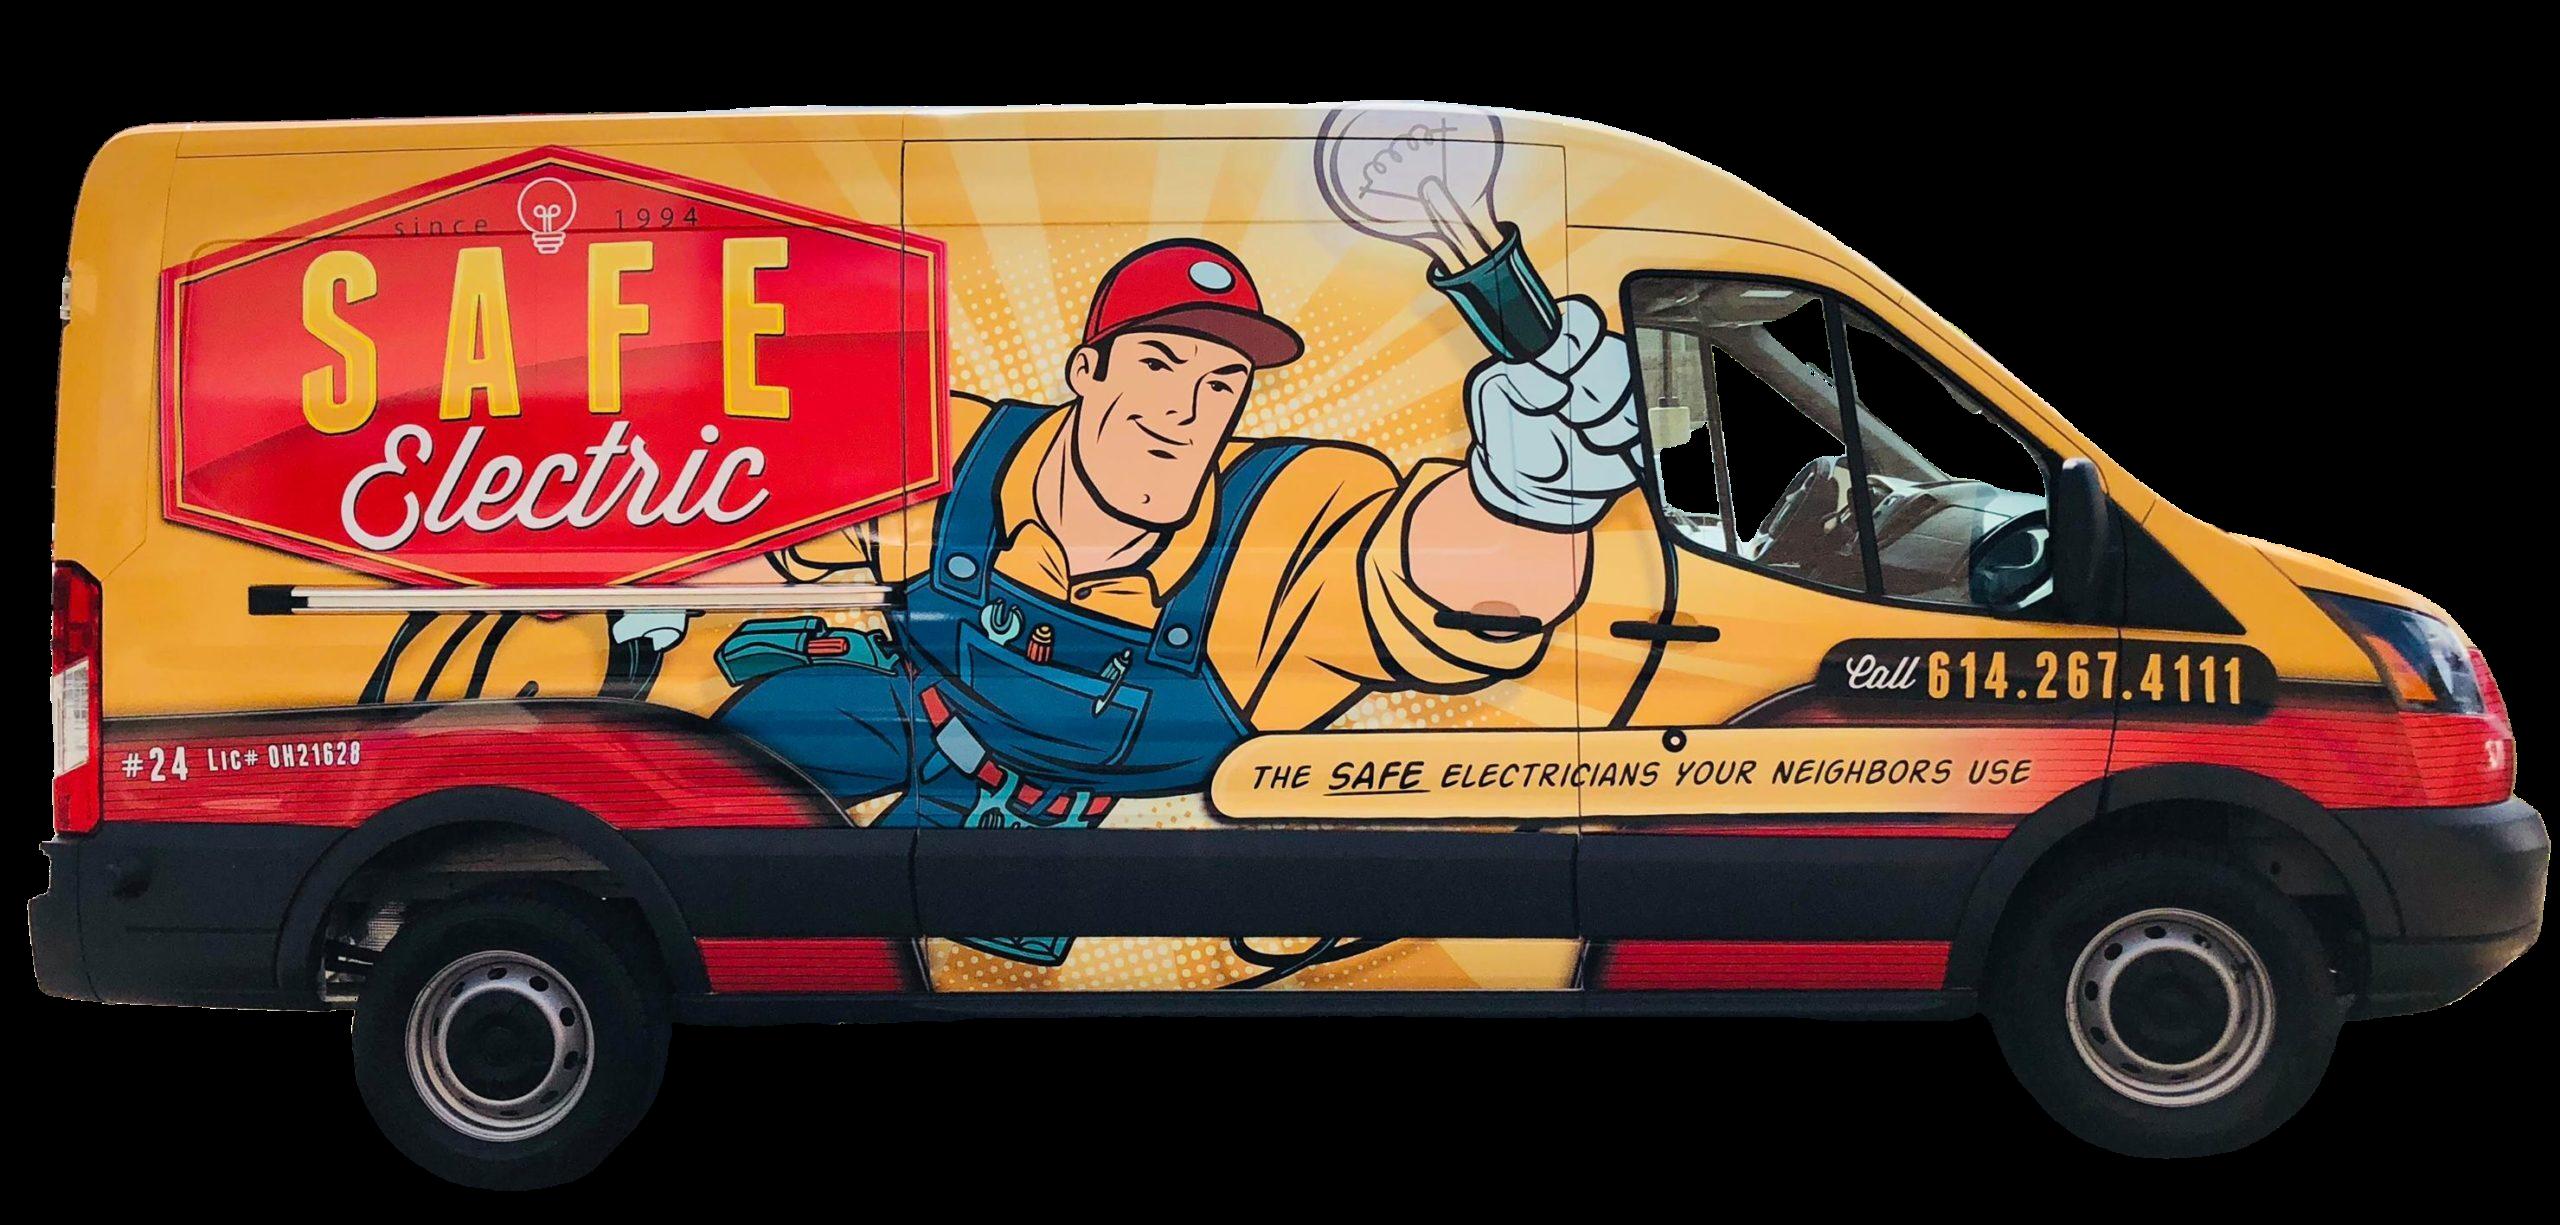 Safe Electric LLC van